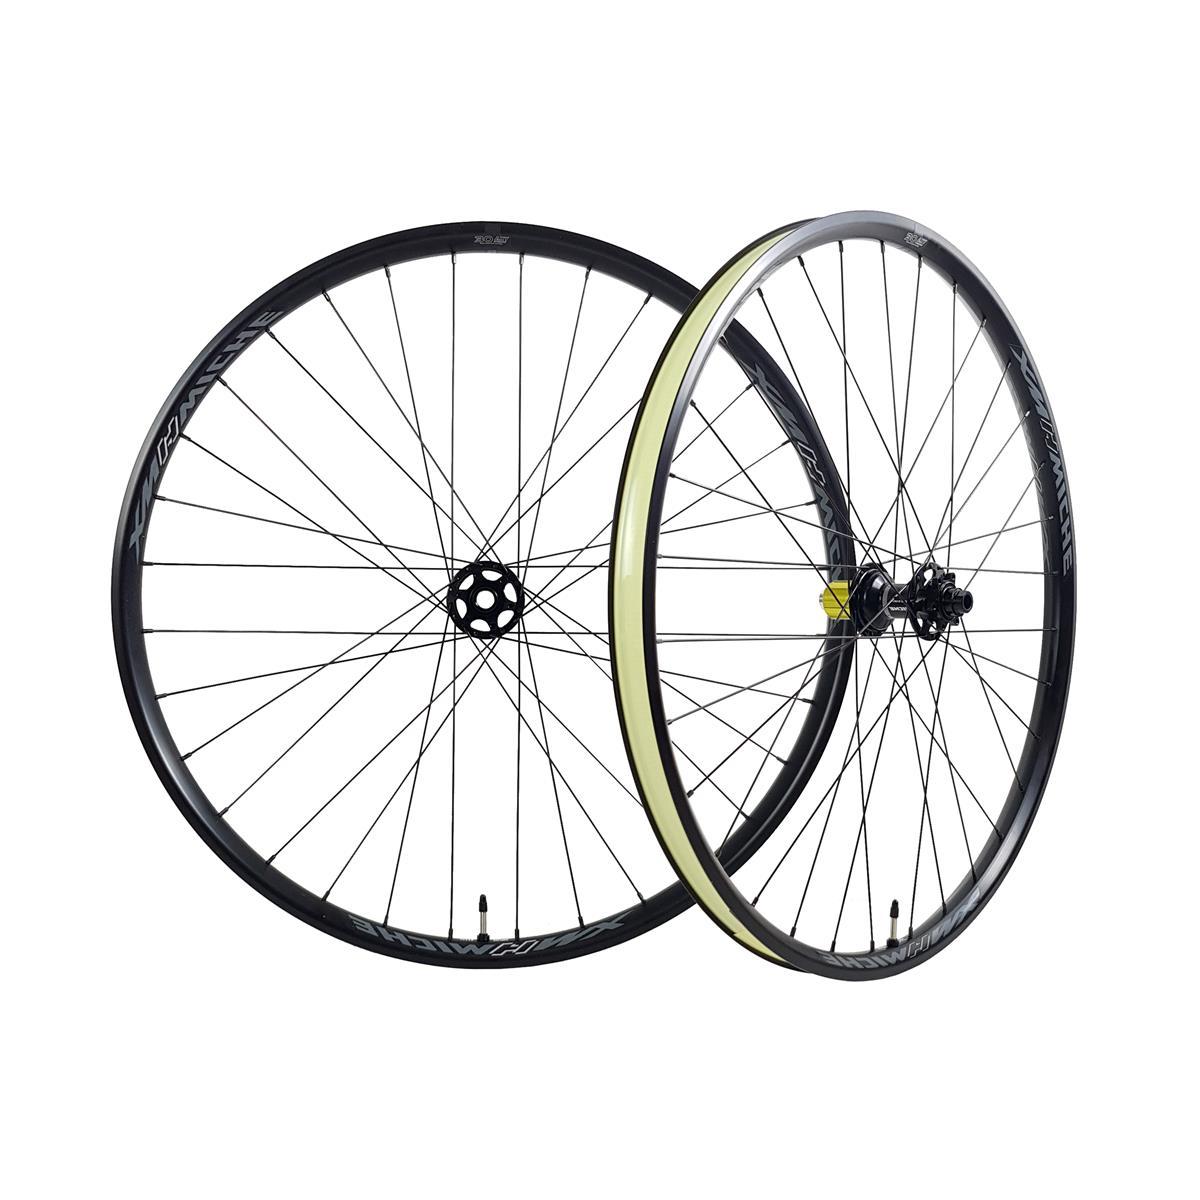 Ebike wheel set XMH R 30 29'' Boost inner bead width 30mm Shimano HG 10-11s TR